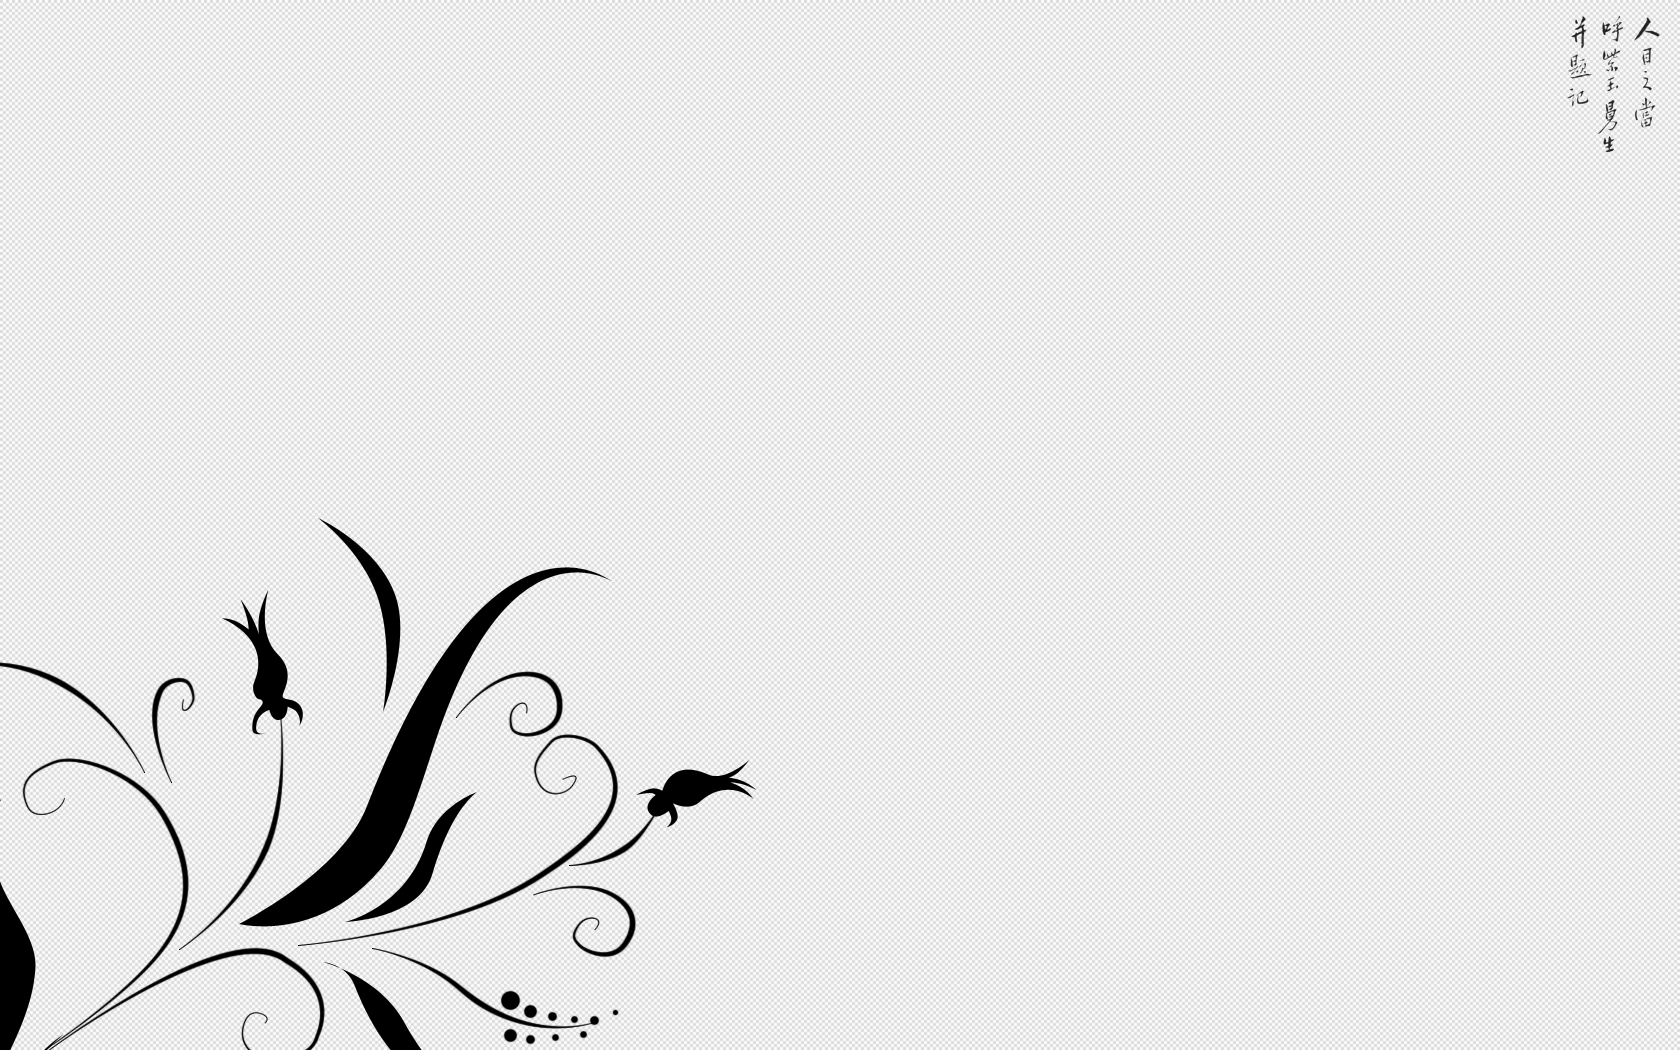 White abstract desktop wallpaper 14 Wallpaper 1680x1050